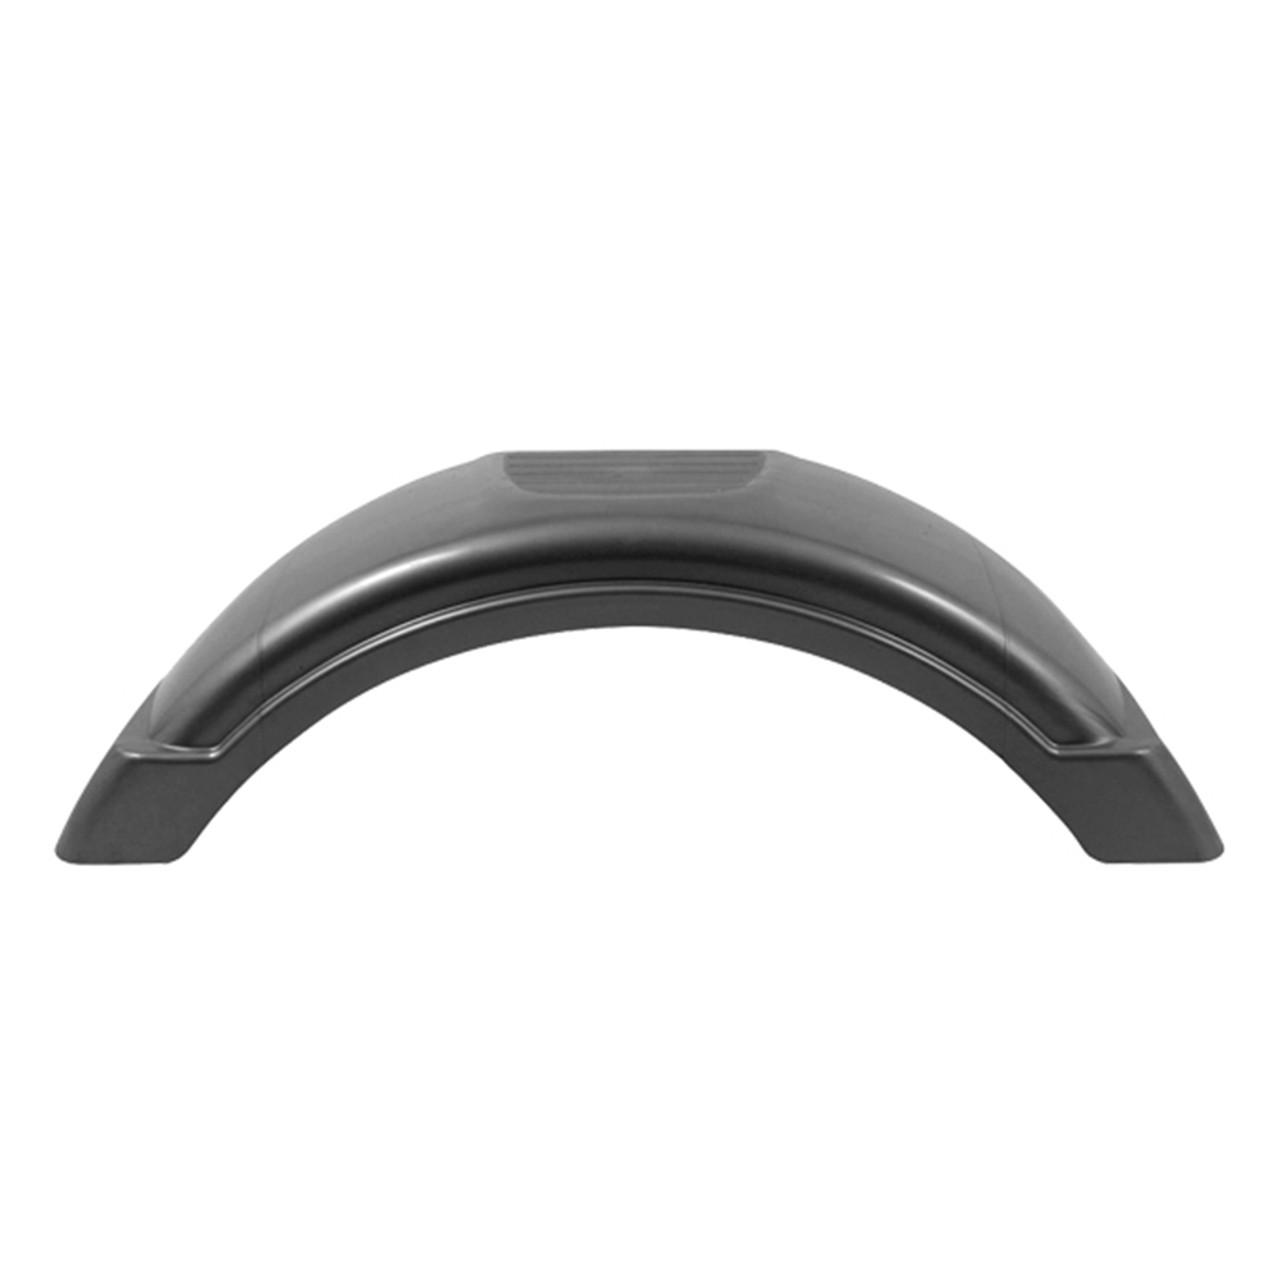 "Silver Plastic Trailer Fender - 8""-12"" Tire Size - One Fender- 008561"